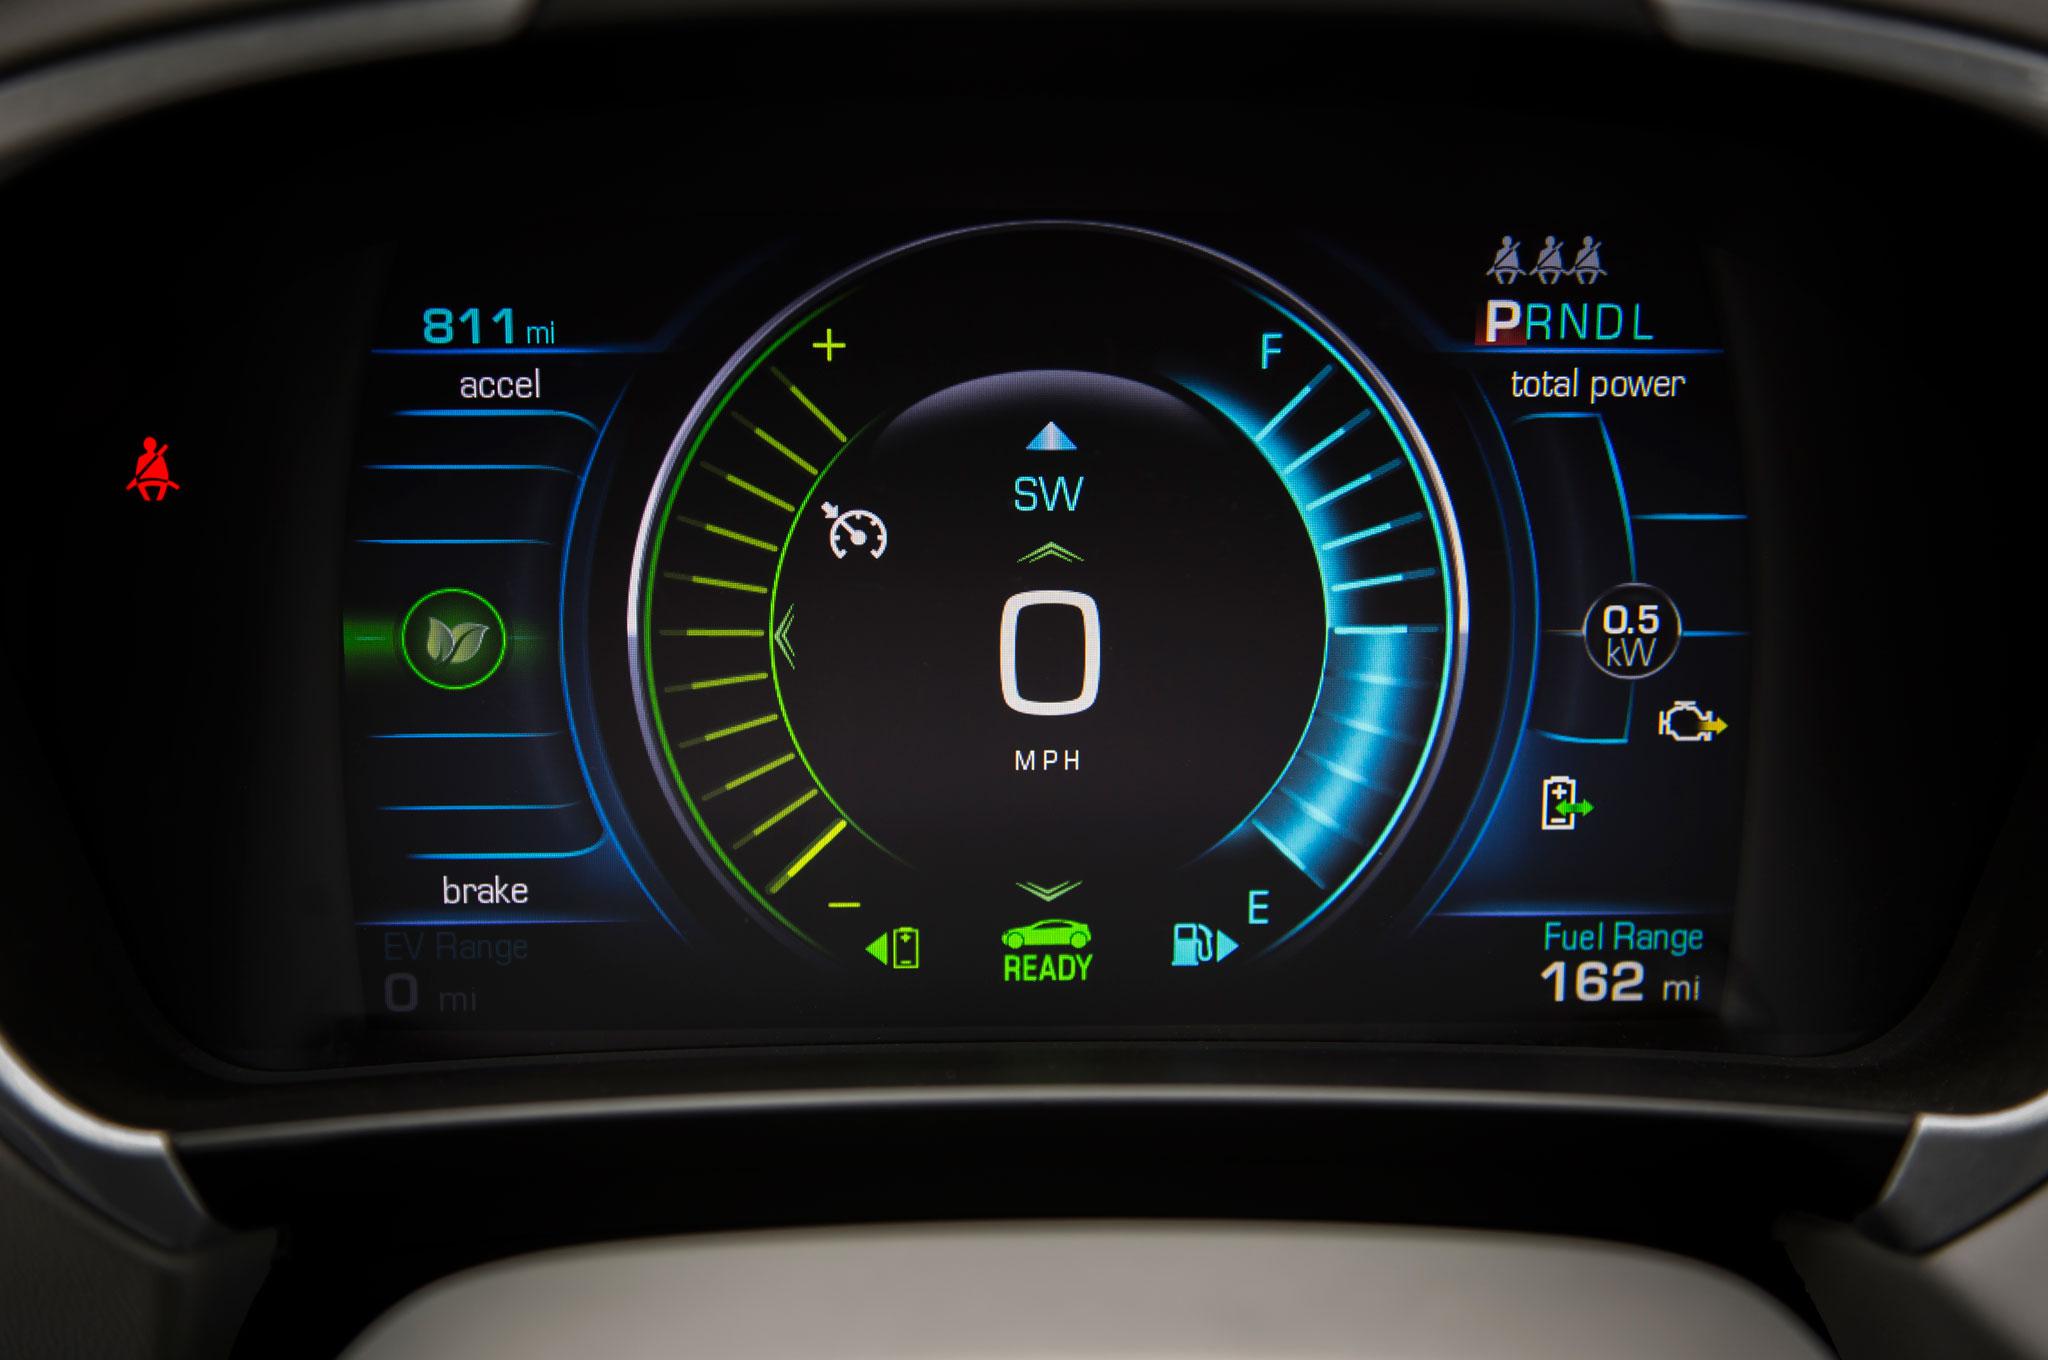 Auto Electric Instrument : Charging ahead chevrolet volt review